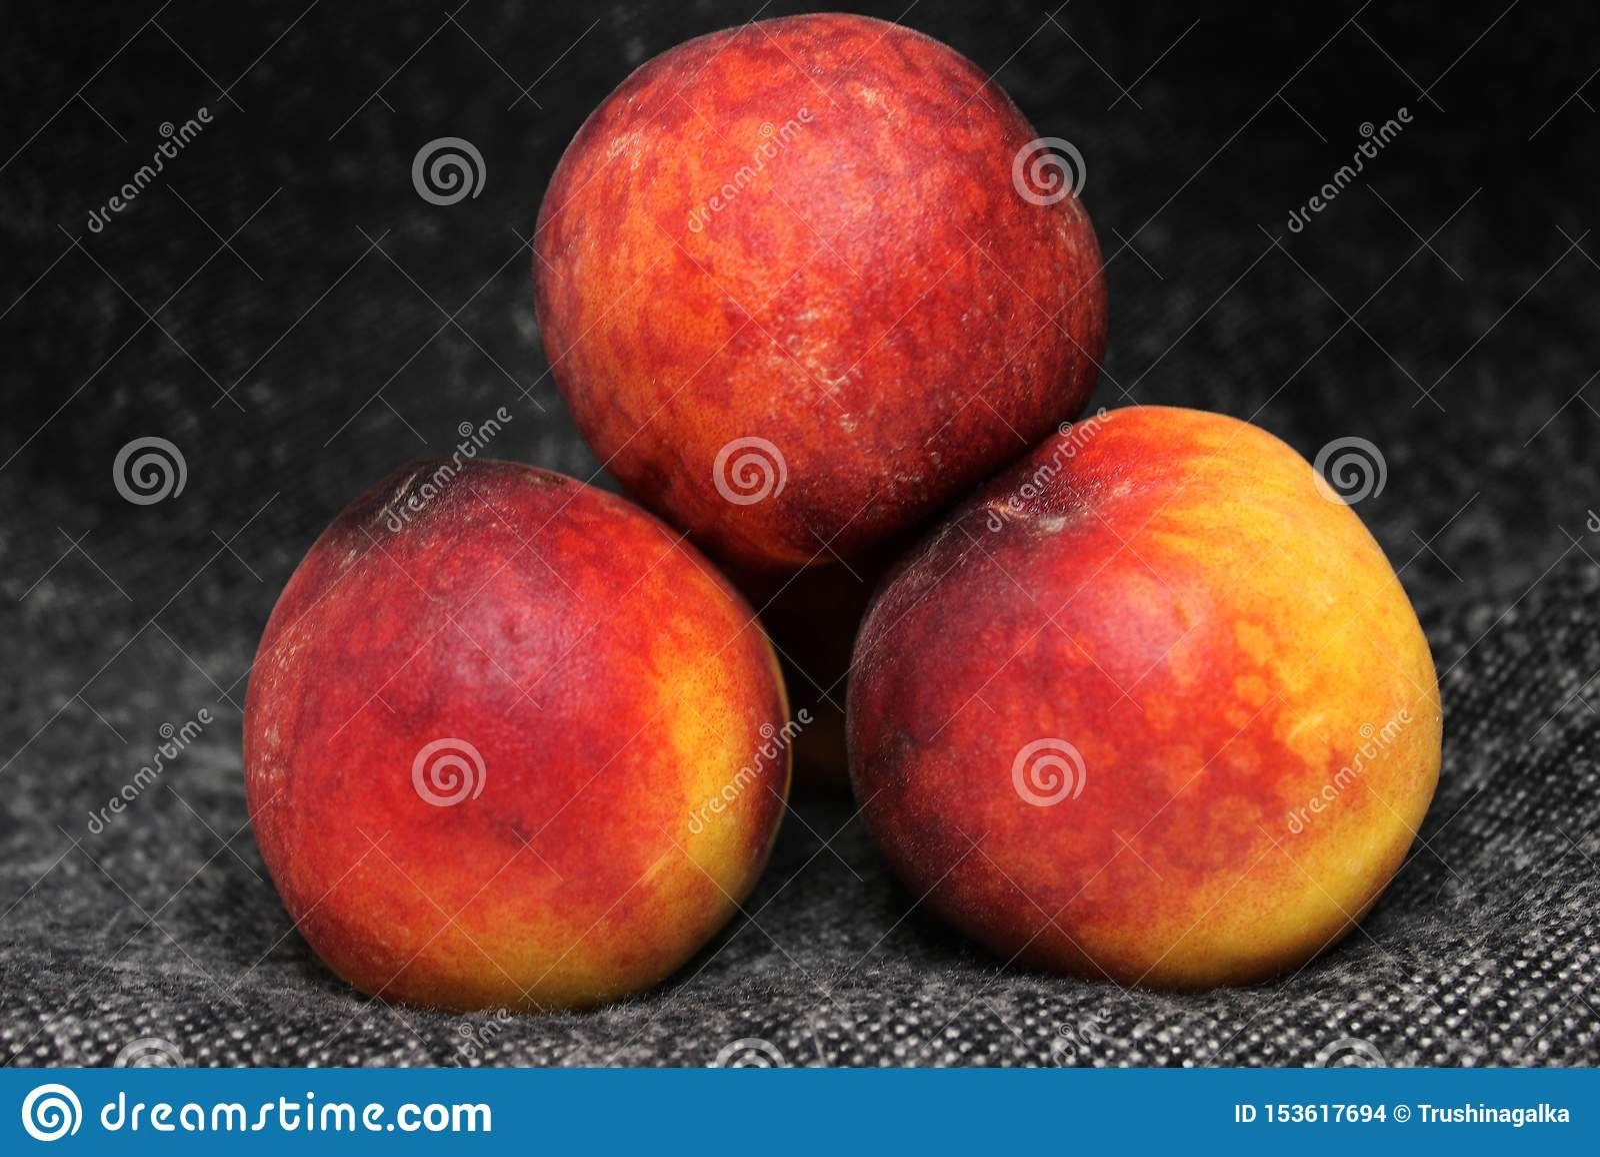 The peach on the dark background